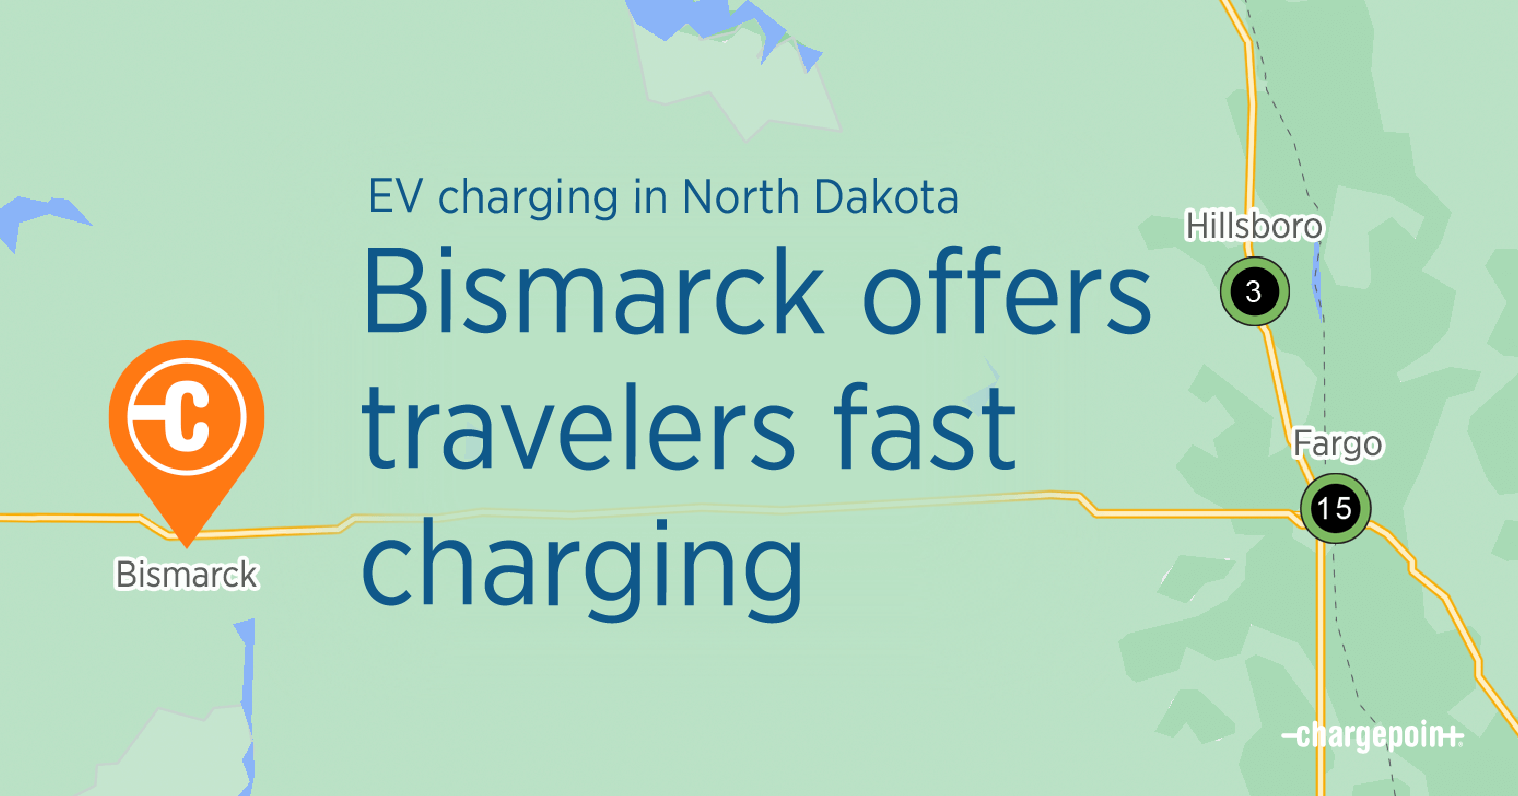 Bismarck offers travelers fast charging